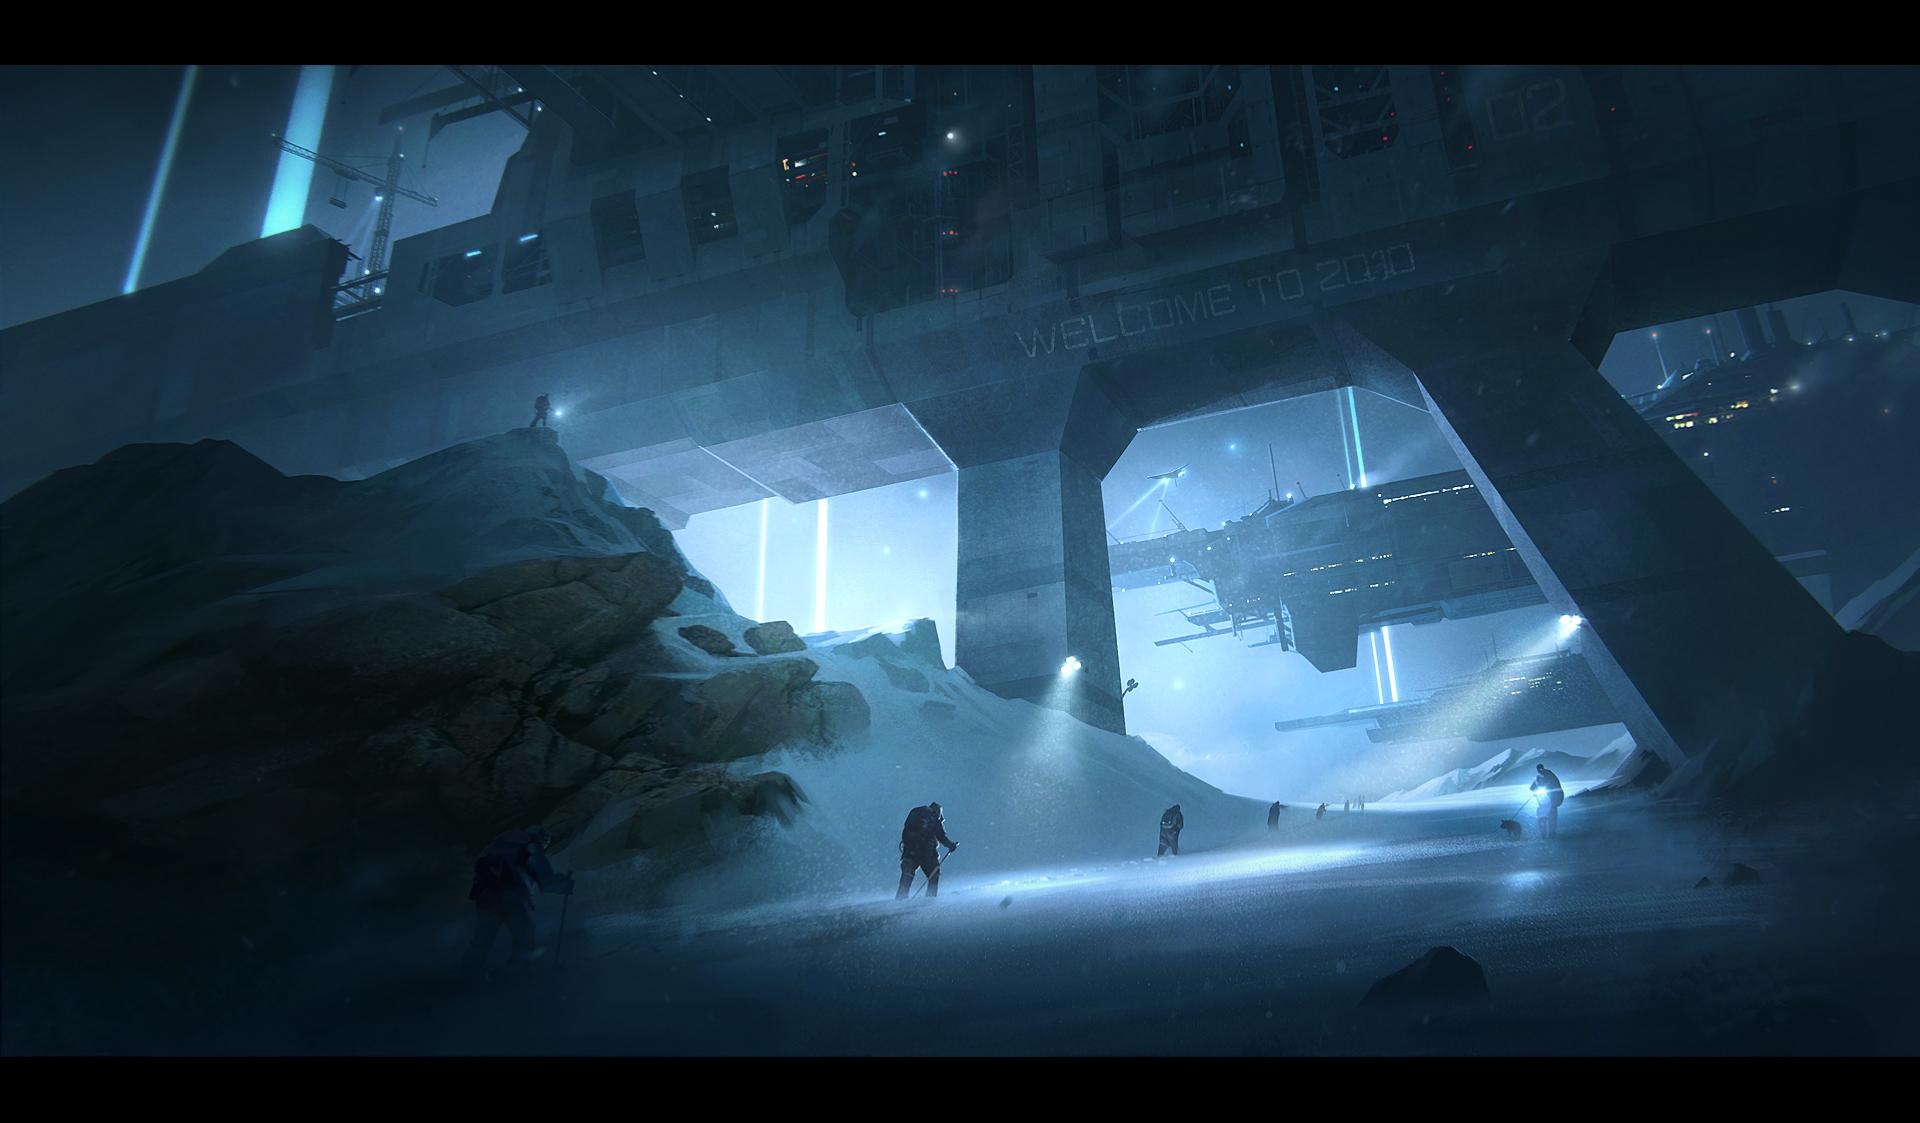 Alpha Coders Wallpaper Abyss Sci Fi Landscape 113130 1920x1123